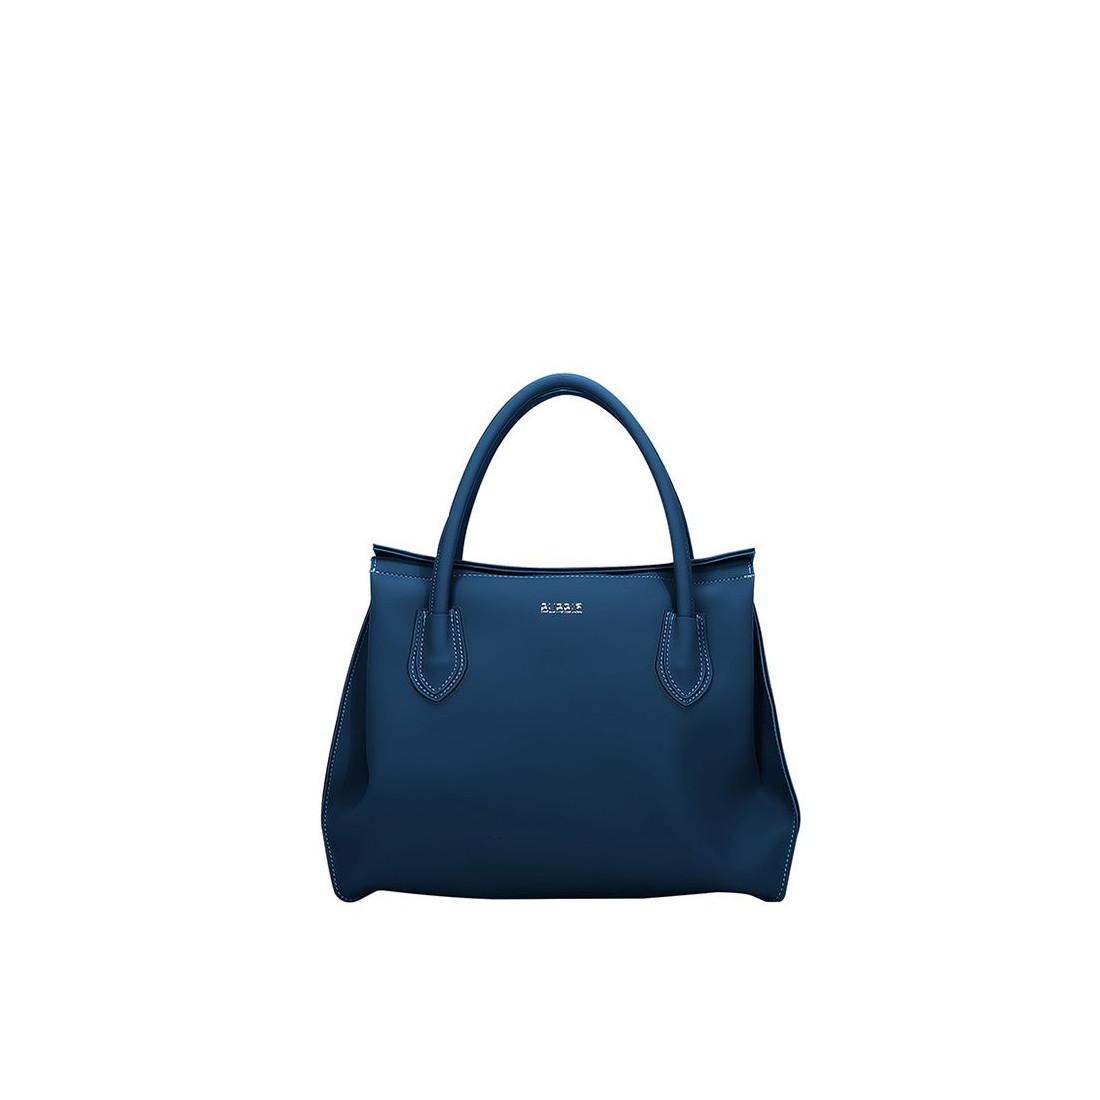 handbags woman bubble by braintropy vkybubcnt073 414